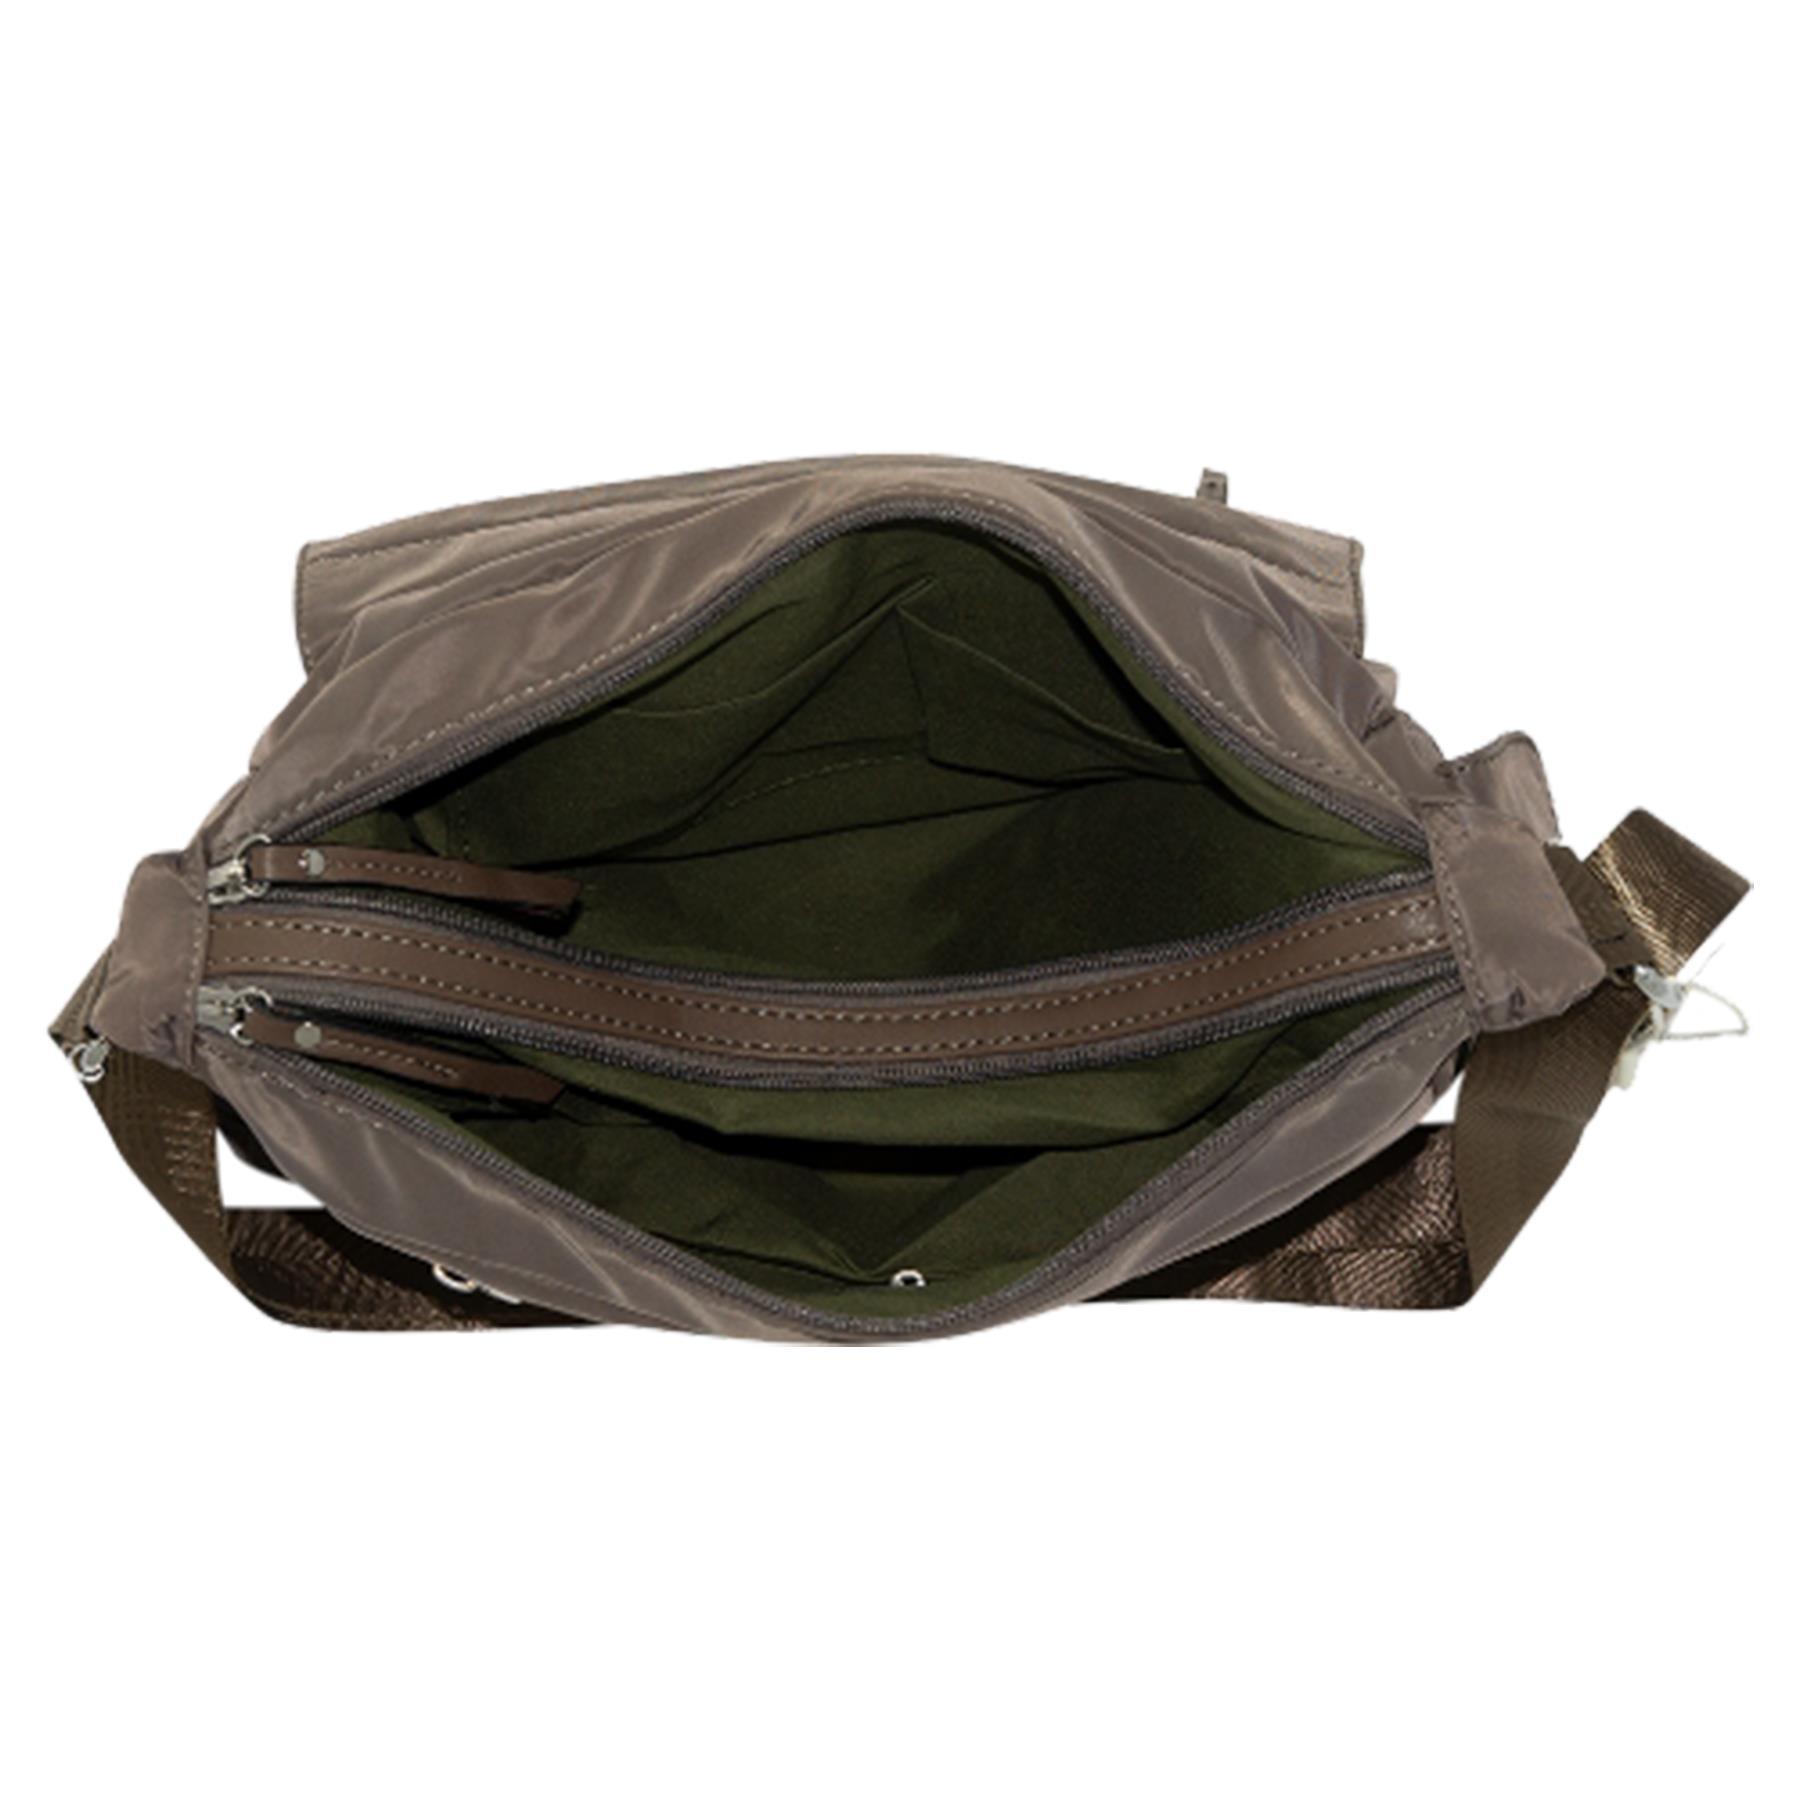 New-Ladies-Men-s-Showerproof-School-College-Practical-Basic-Crossbody-Bag thumbnail 43